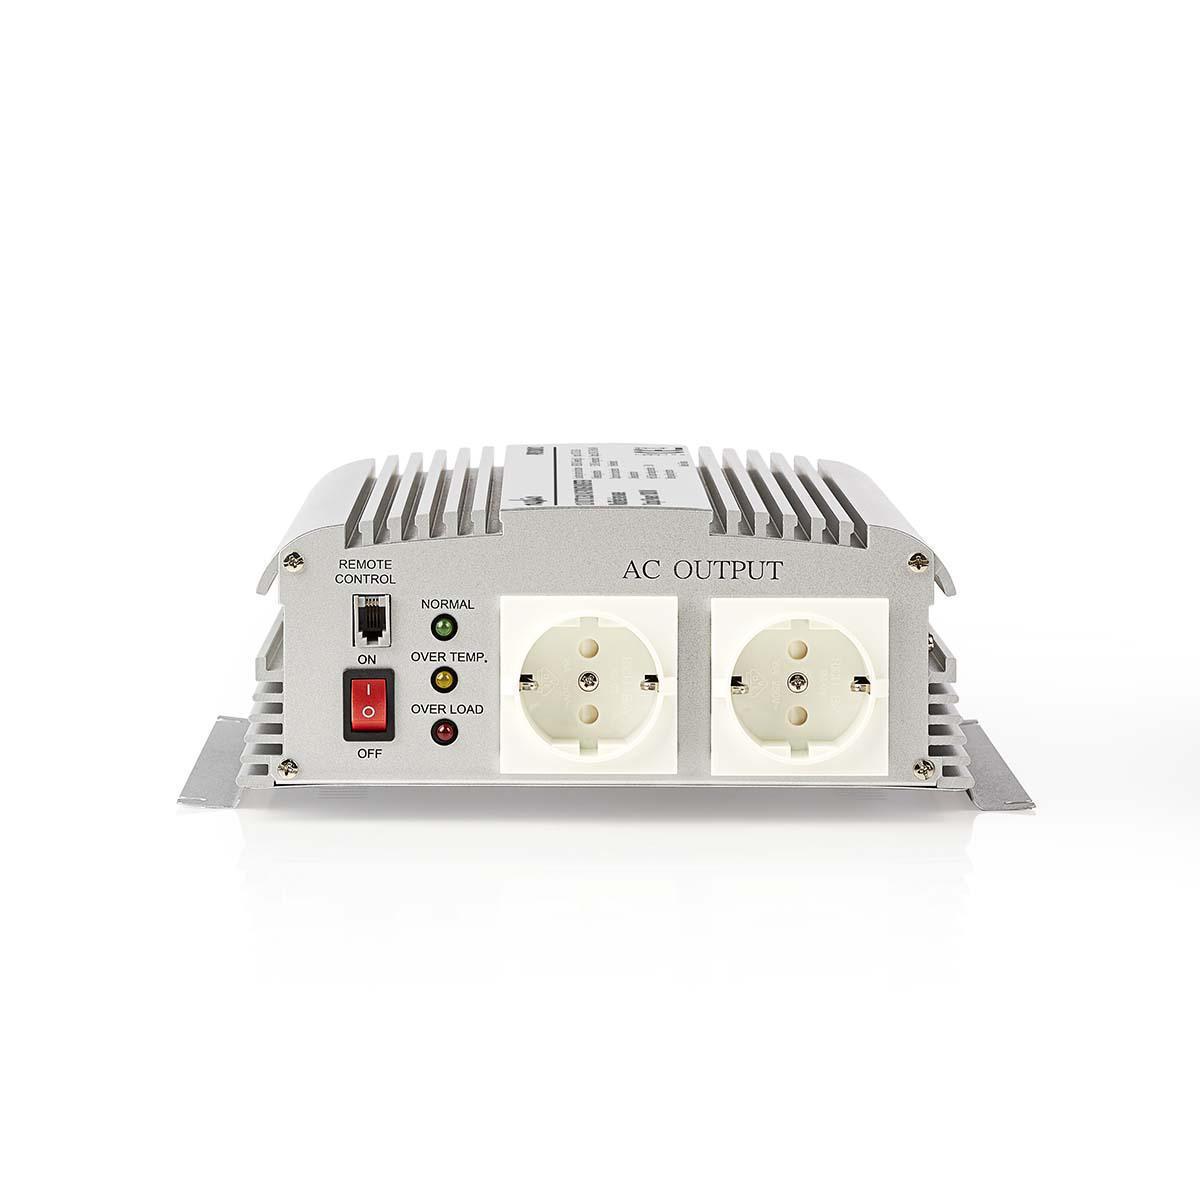 Stroomomvormer Gemodificeerde Sinusgolf | 12 V DC 230 V AC | 1000 W | 2x Schuko-Uitgang